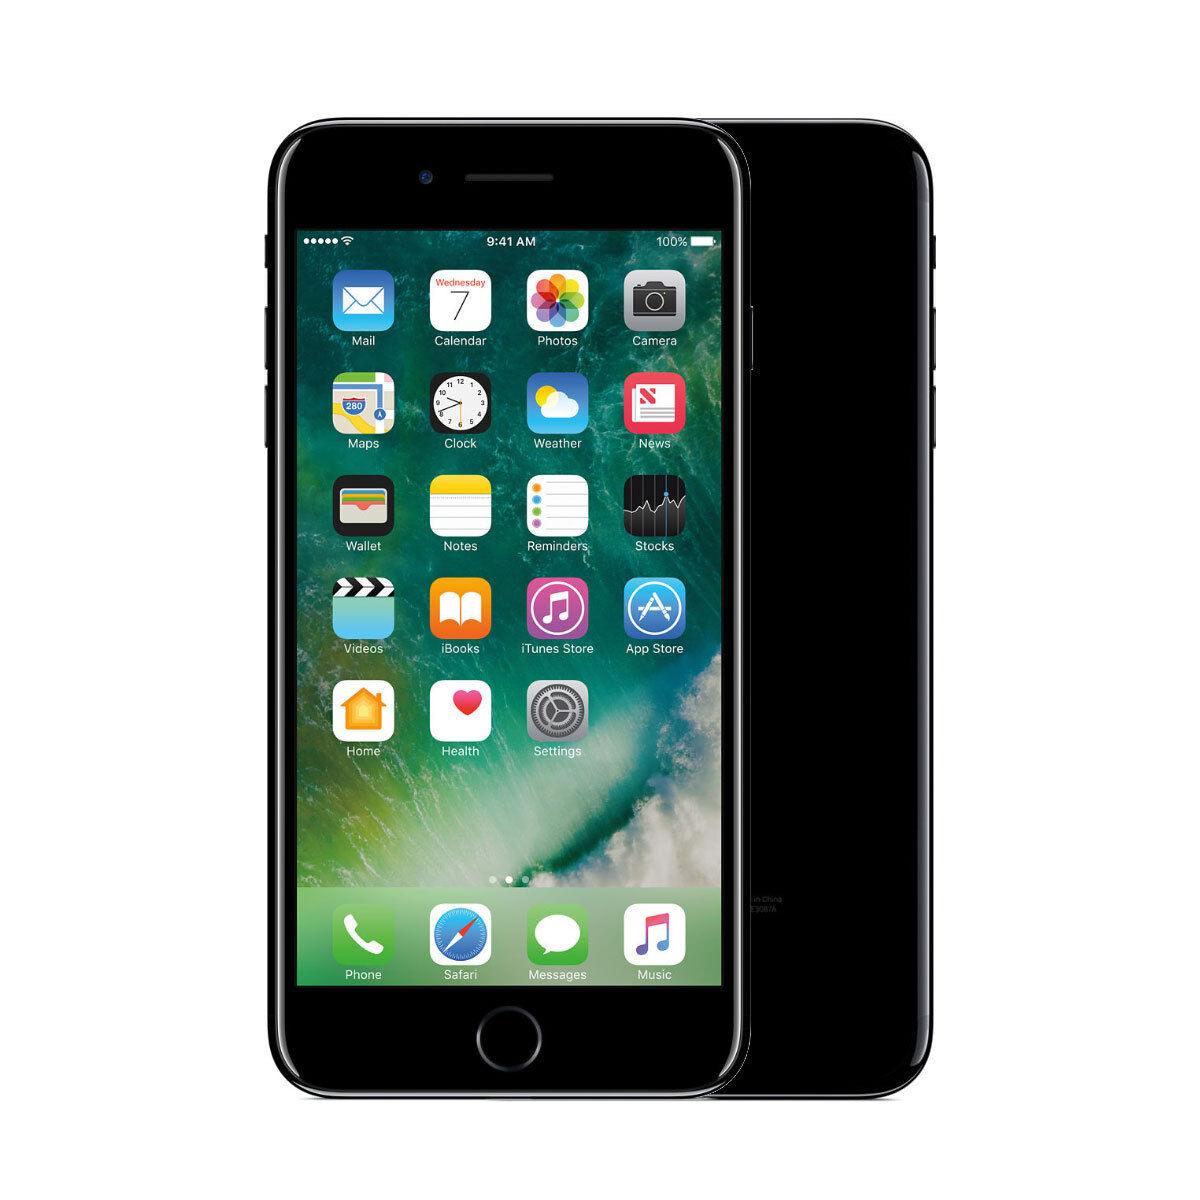 Apple iPhone 7 Plus 256GB Factory Unlocked 4G LTE iOS WiFi Smartphone